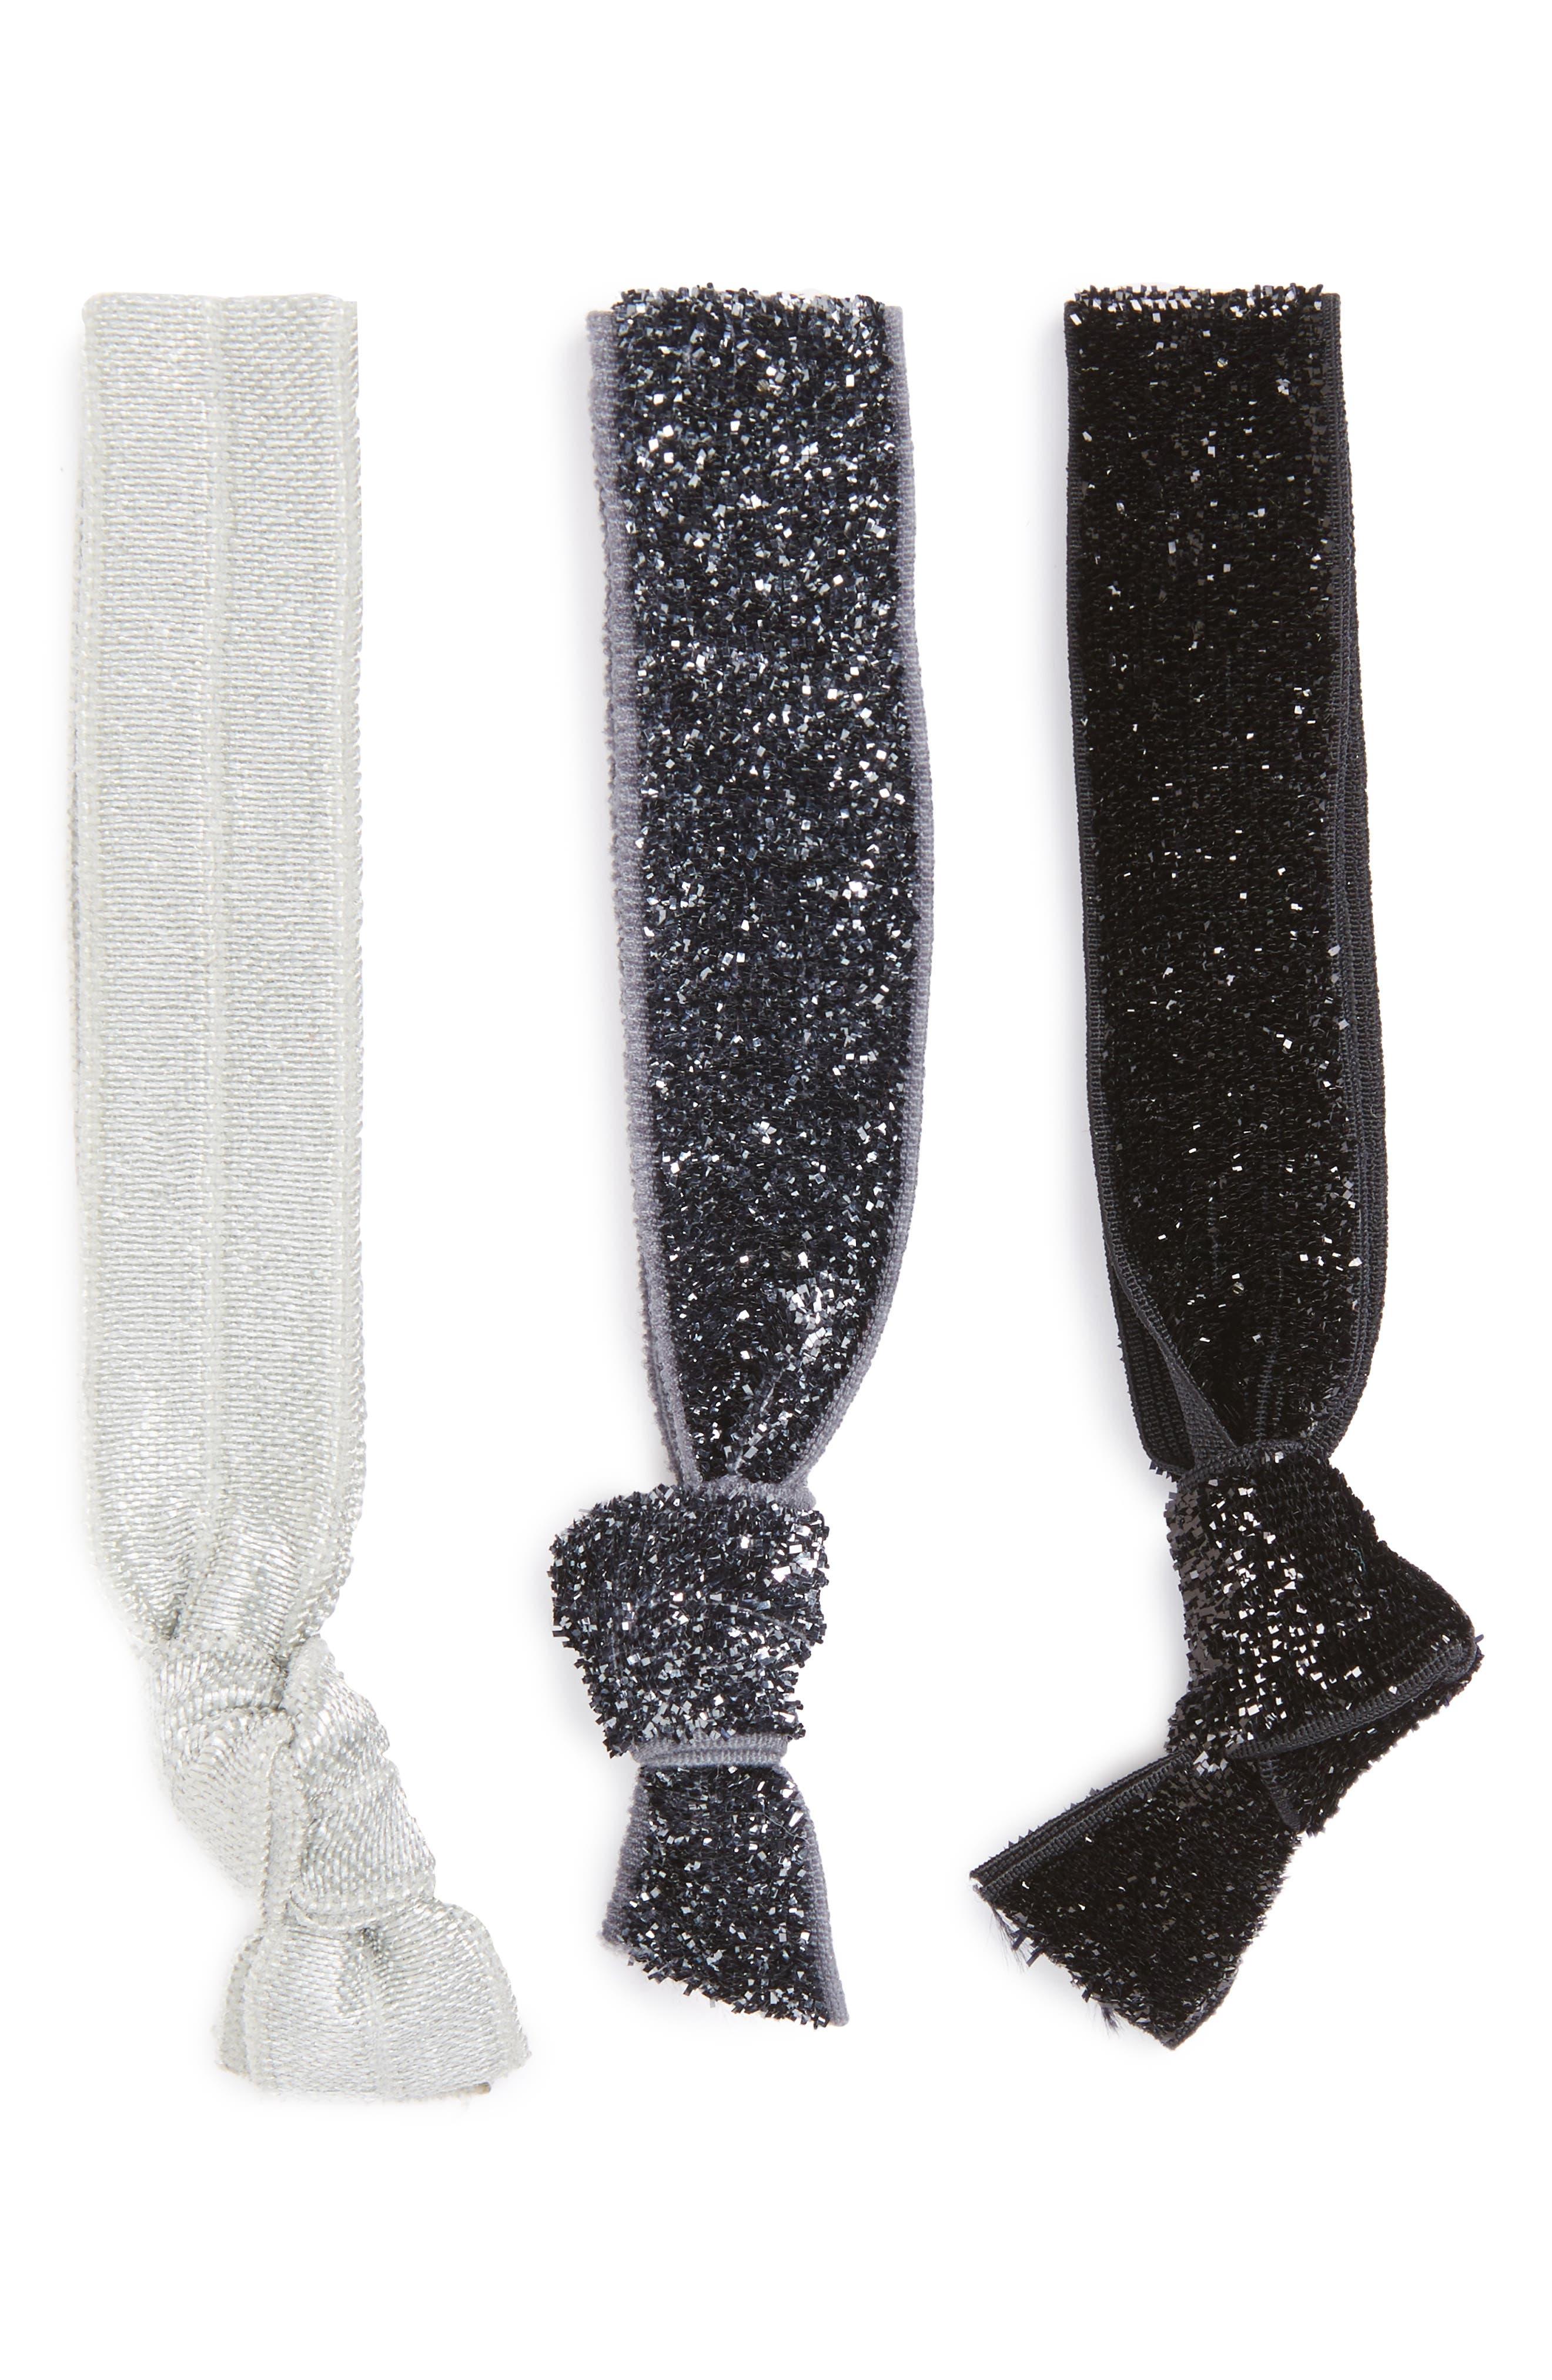 Topshop Glitter Yoga Set of 3 Hair Bands